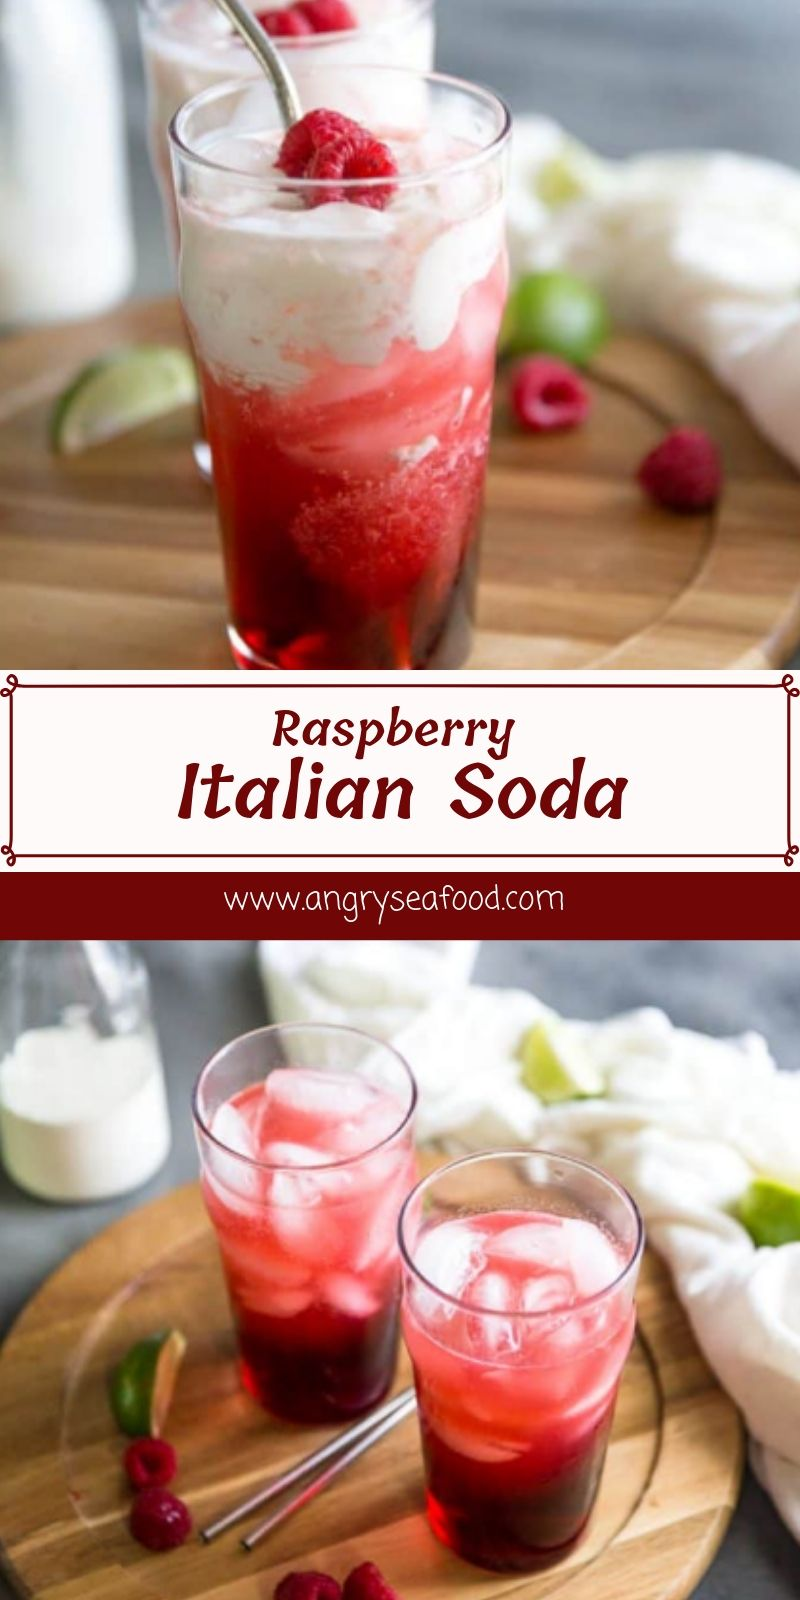 Raspberry Italian Soda